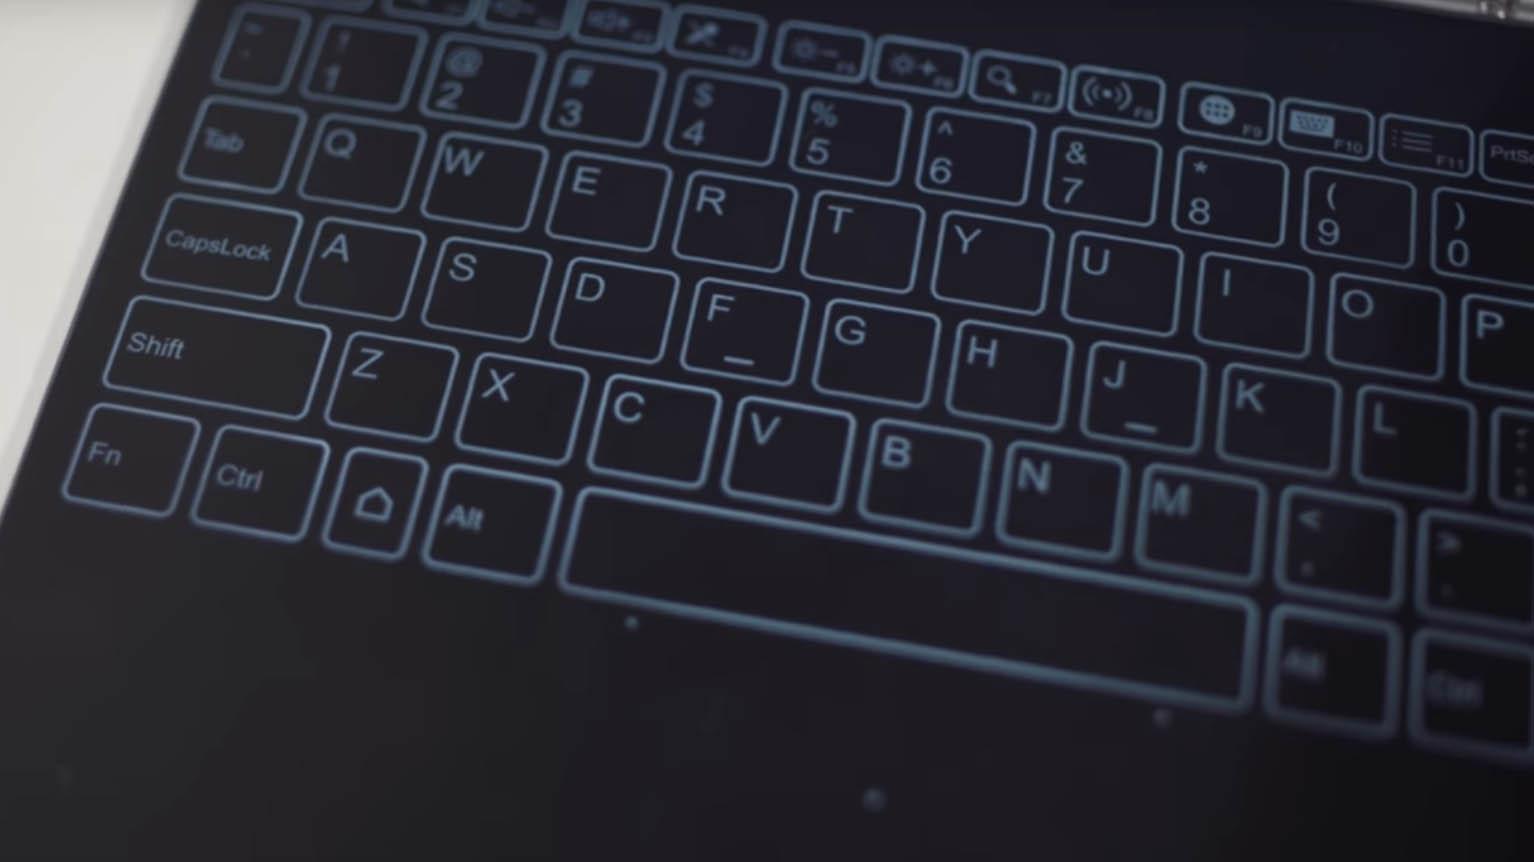 Illuminazione tastiera notebook asus n e n foto e video live